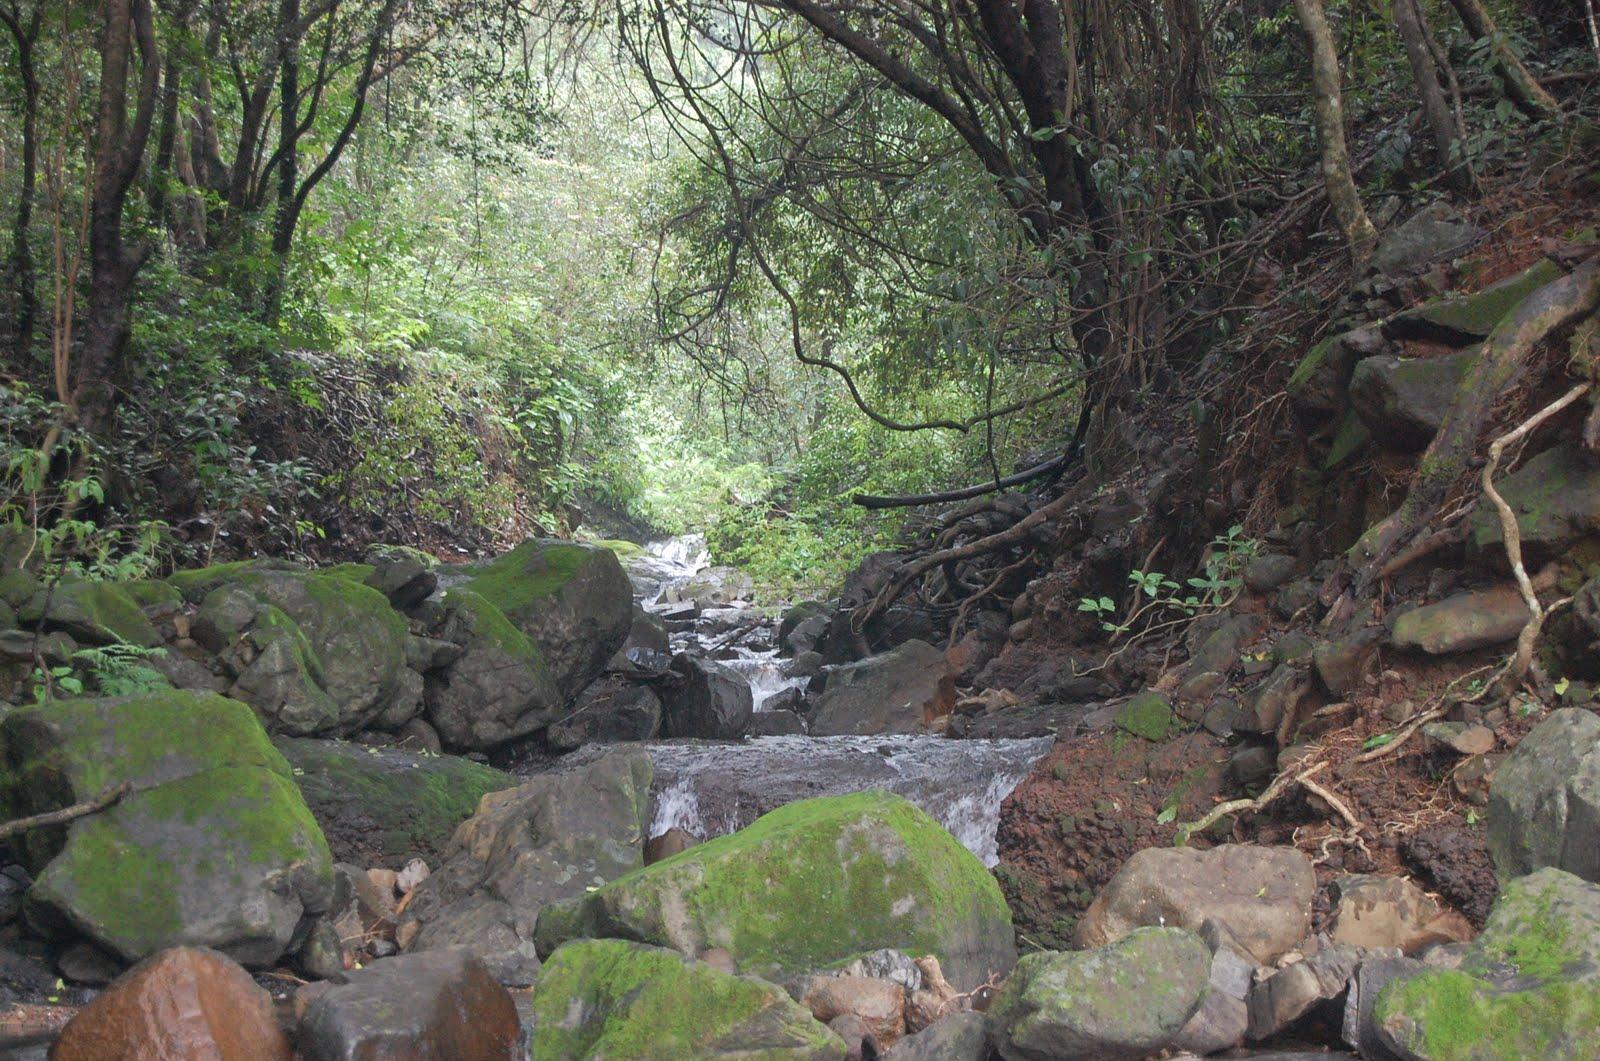 Rain Forest near Nisargshala Campsite